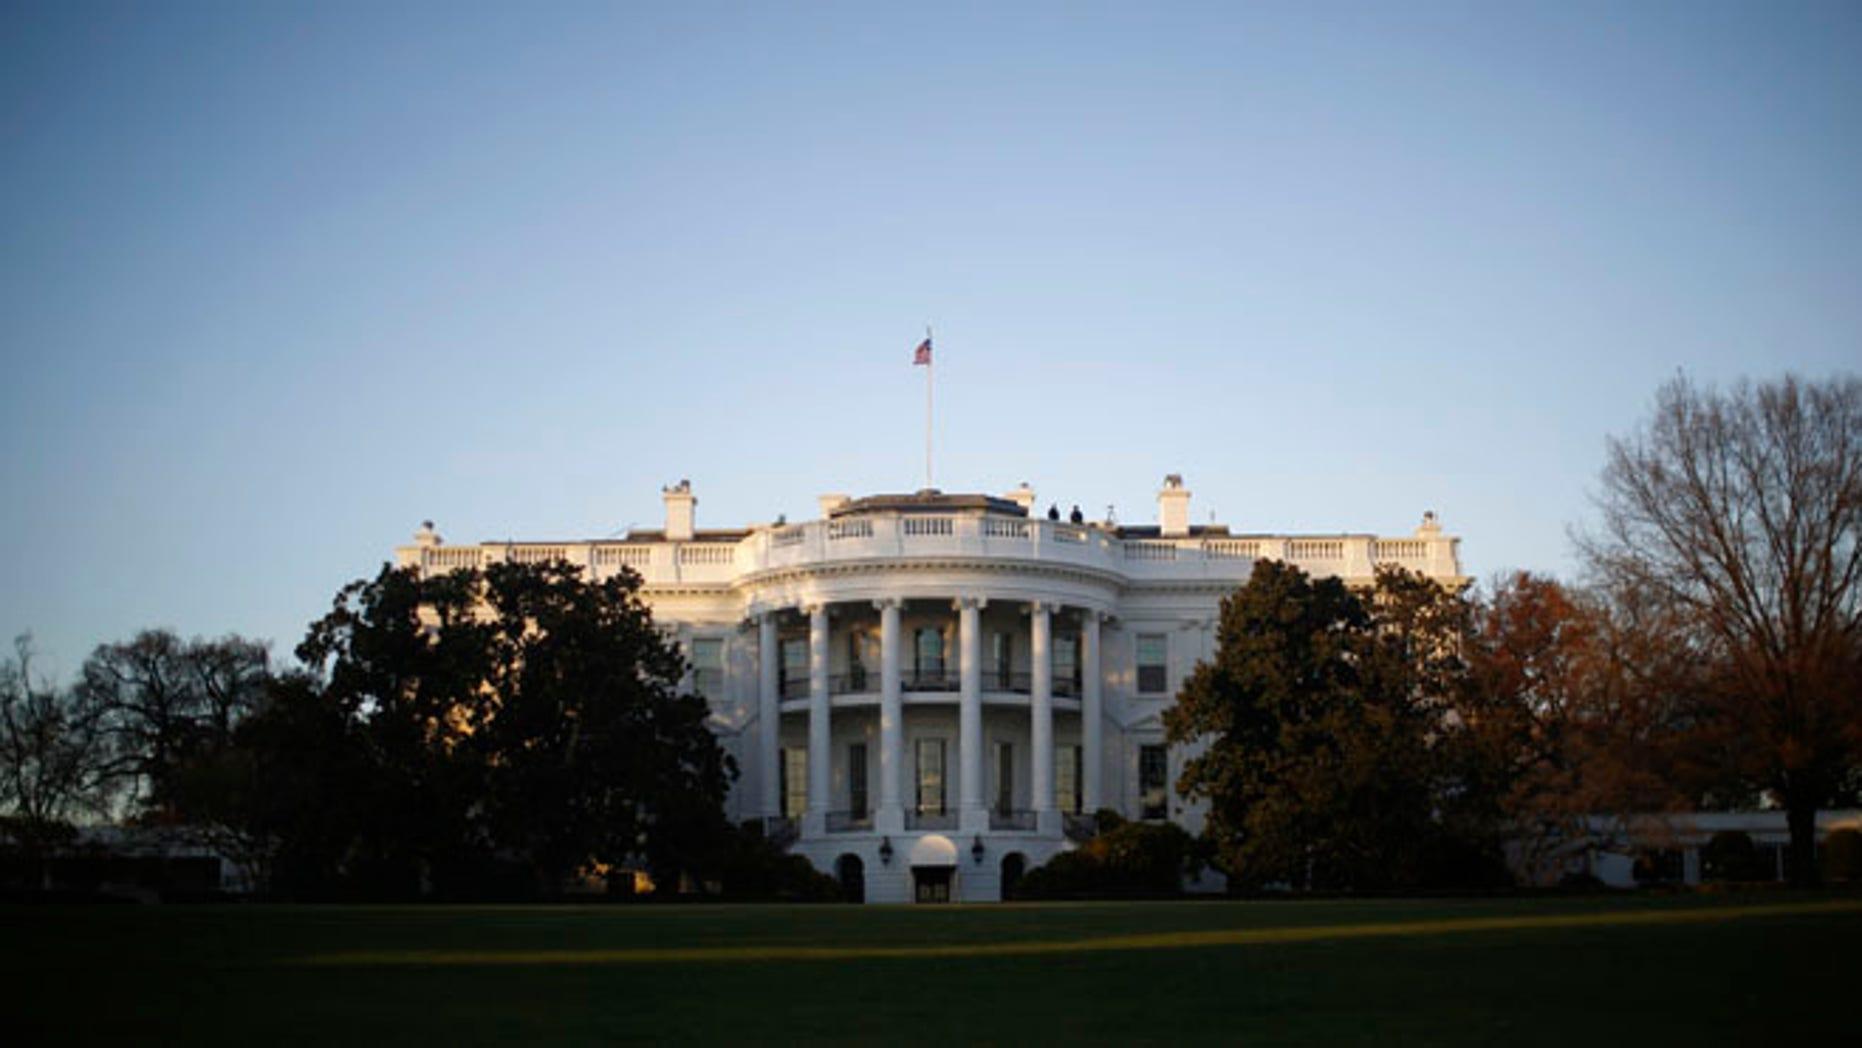 The White House in Washington, November 19, 2013.